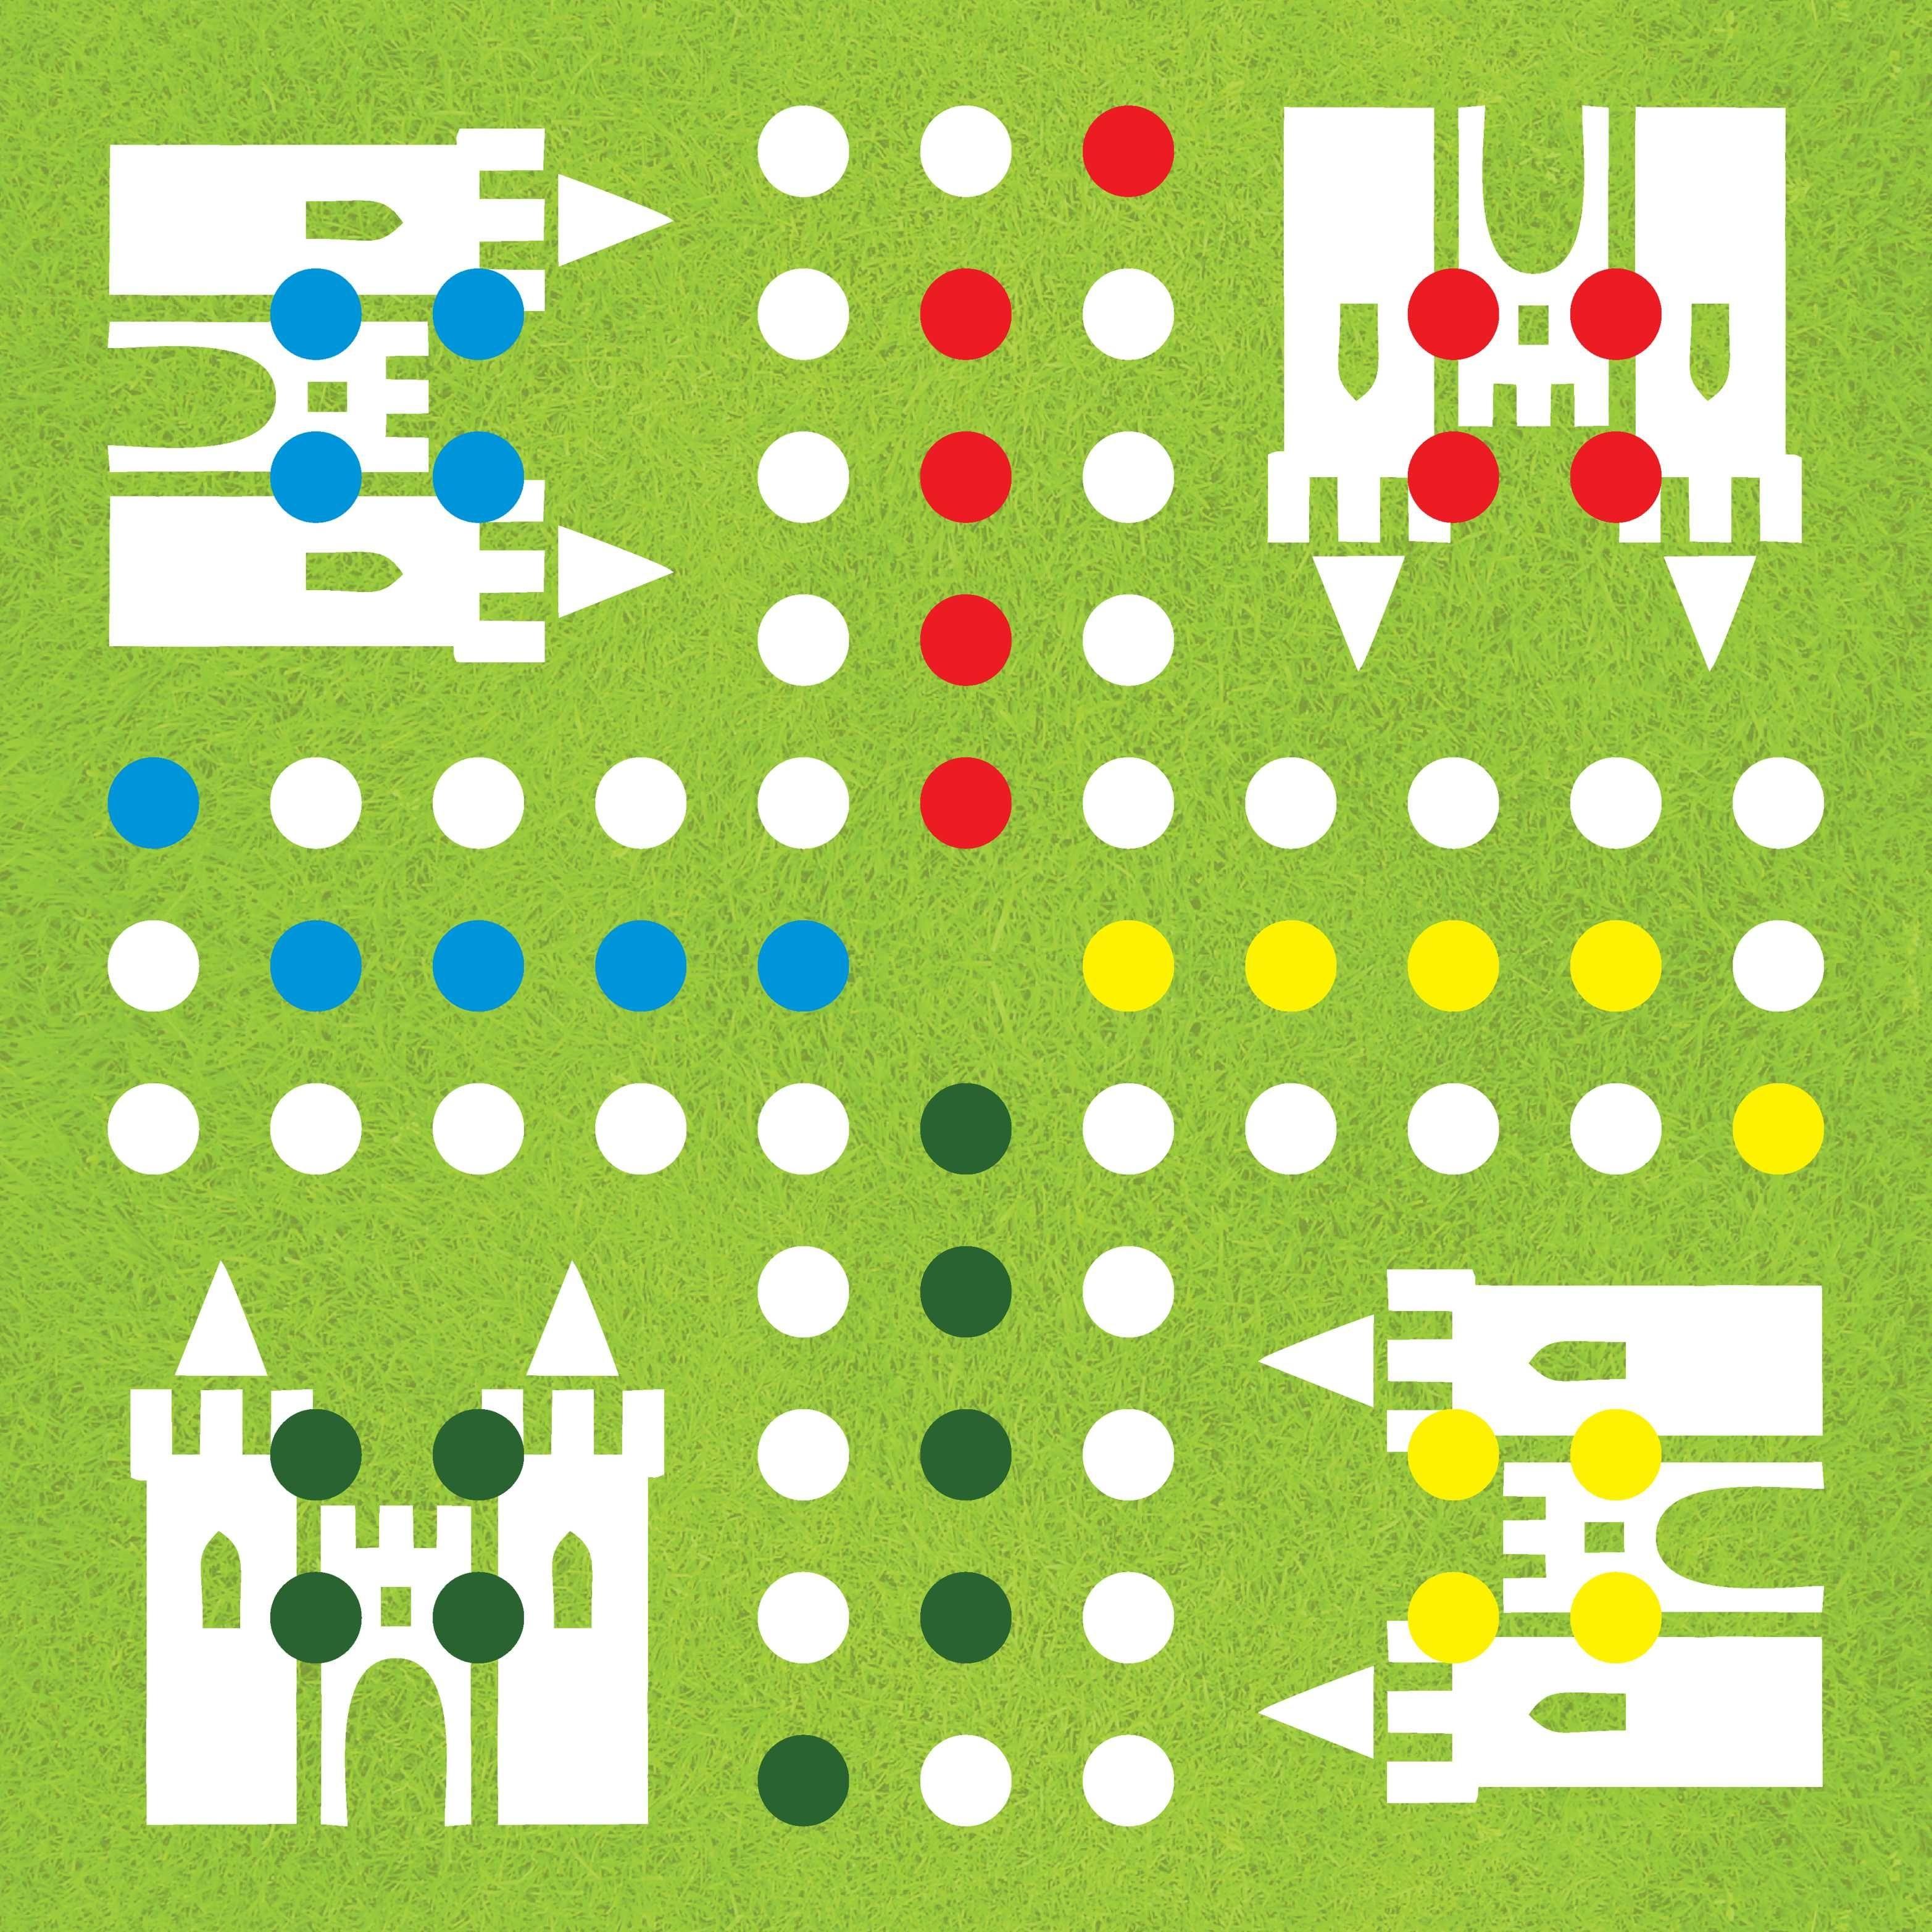 Diy-Ludo-Board-Game-Template -   Board Game   Társasjátékok, Játékok - Free Printable Ludo Board